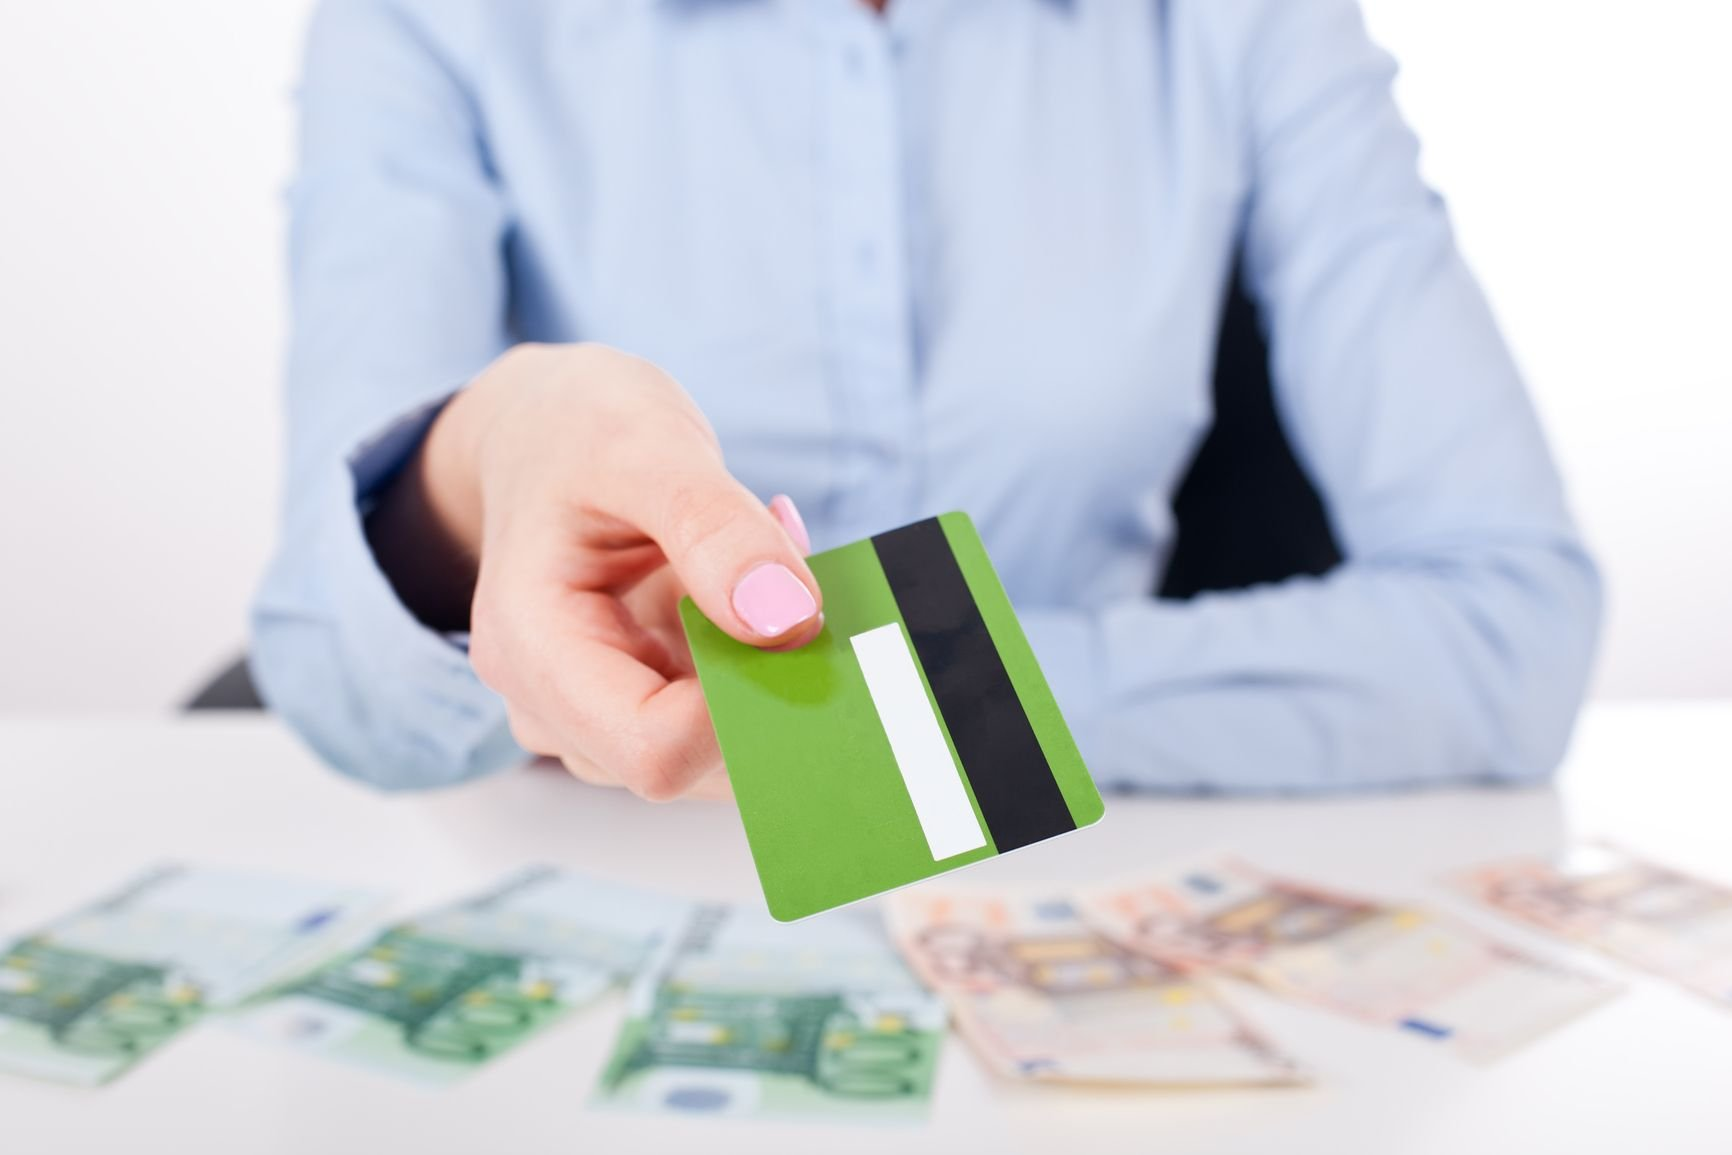 Условия кредитования в Сбербанке